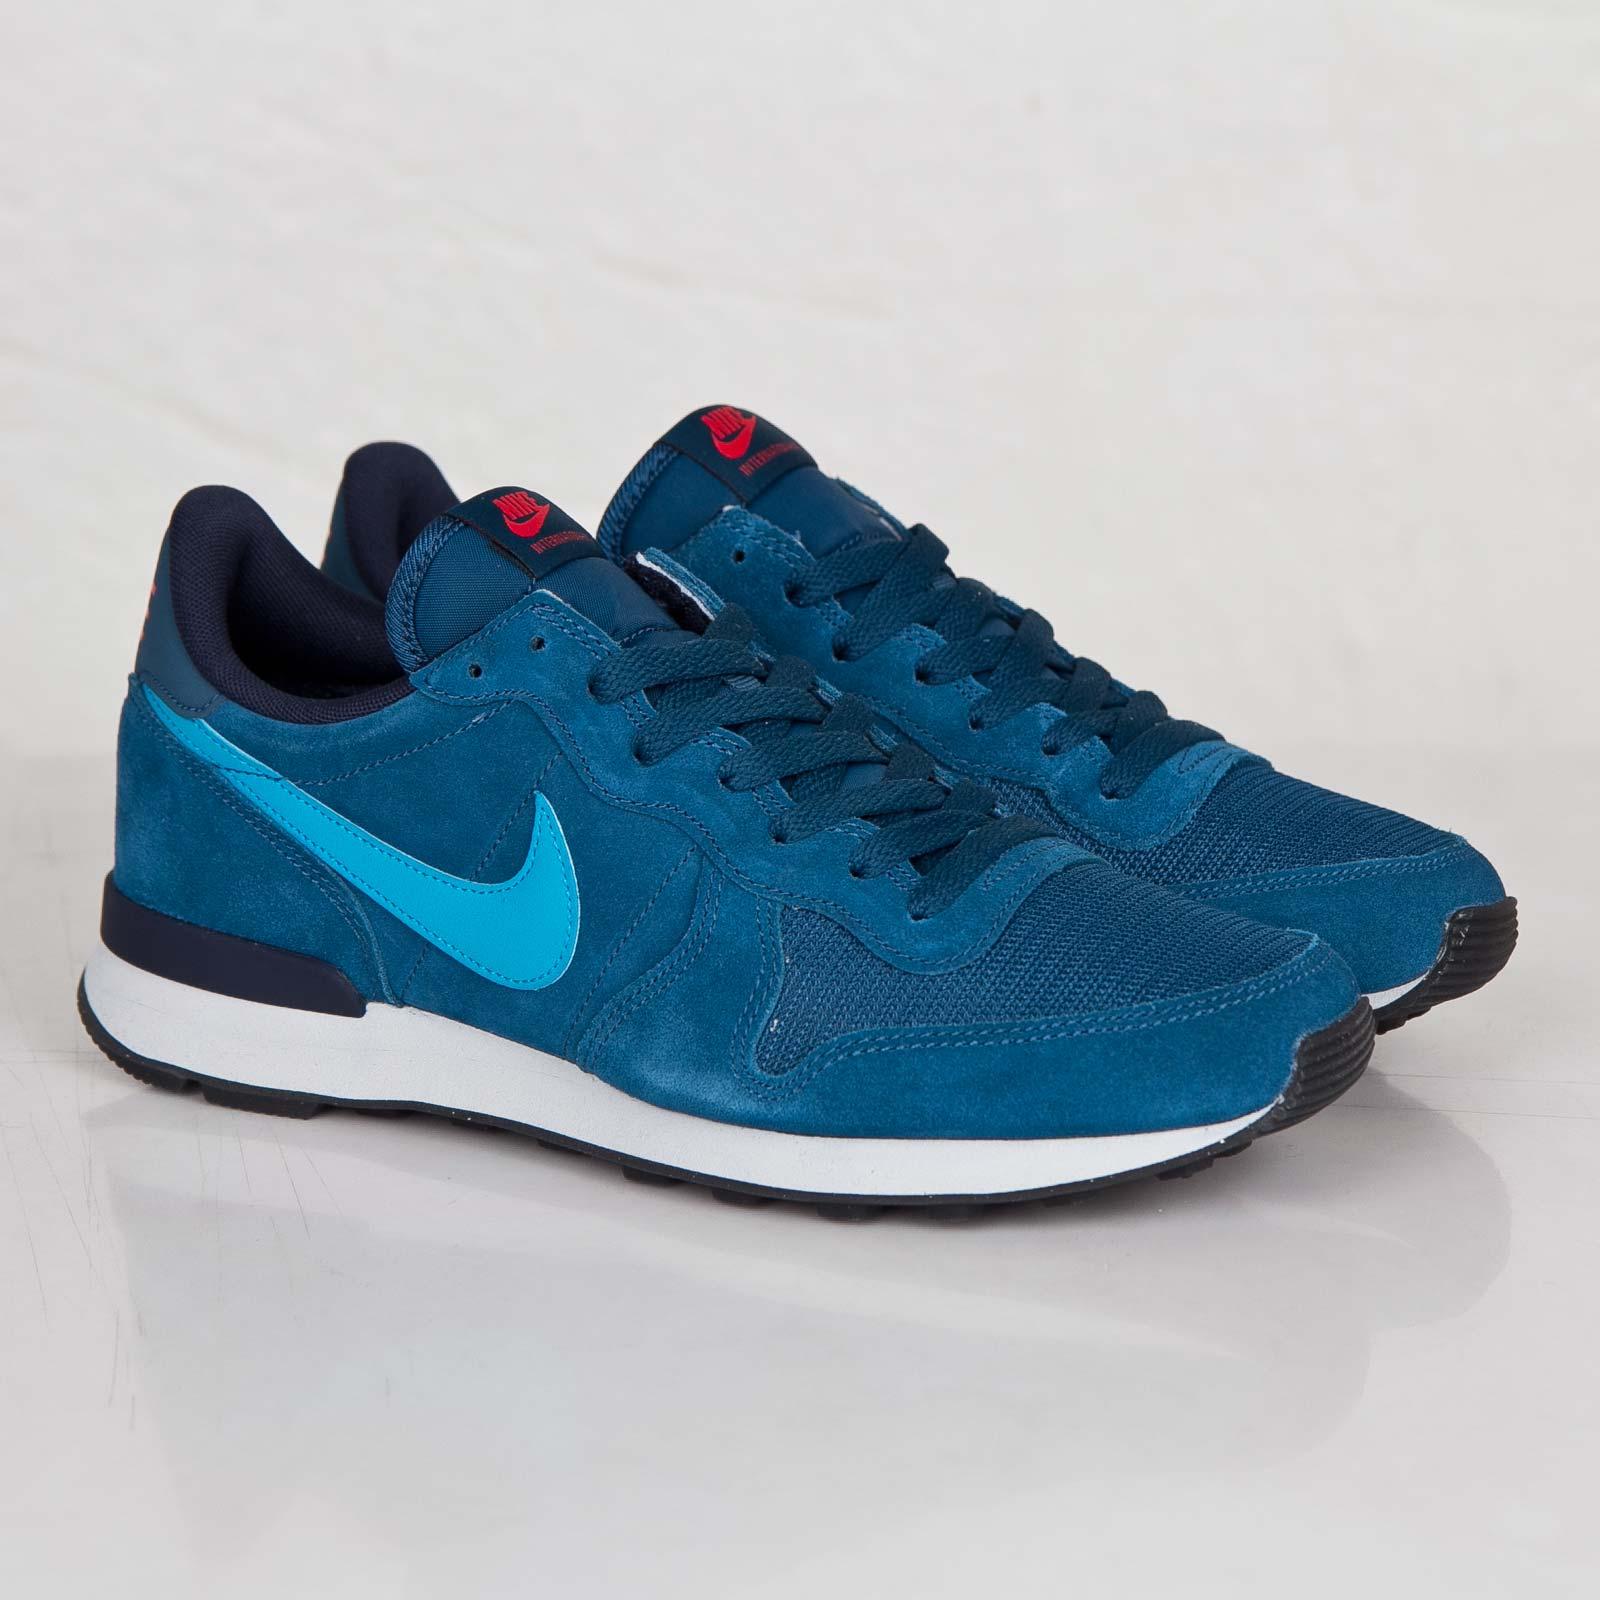 new style cec6c 91bc3 Nike Internationalist Leather